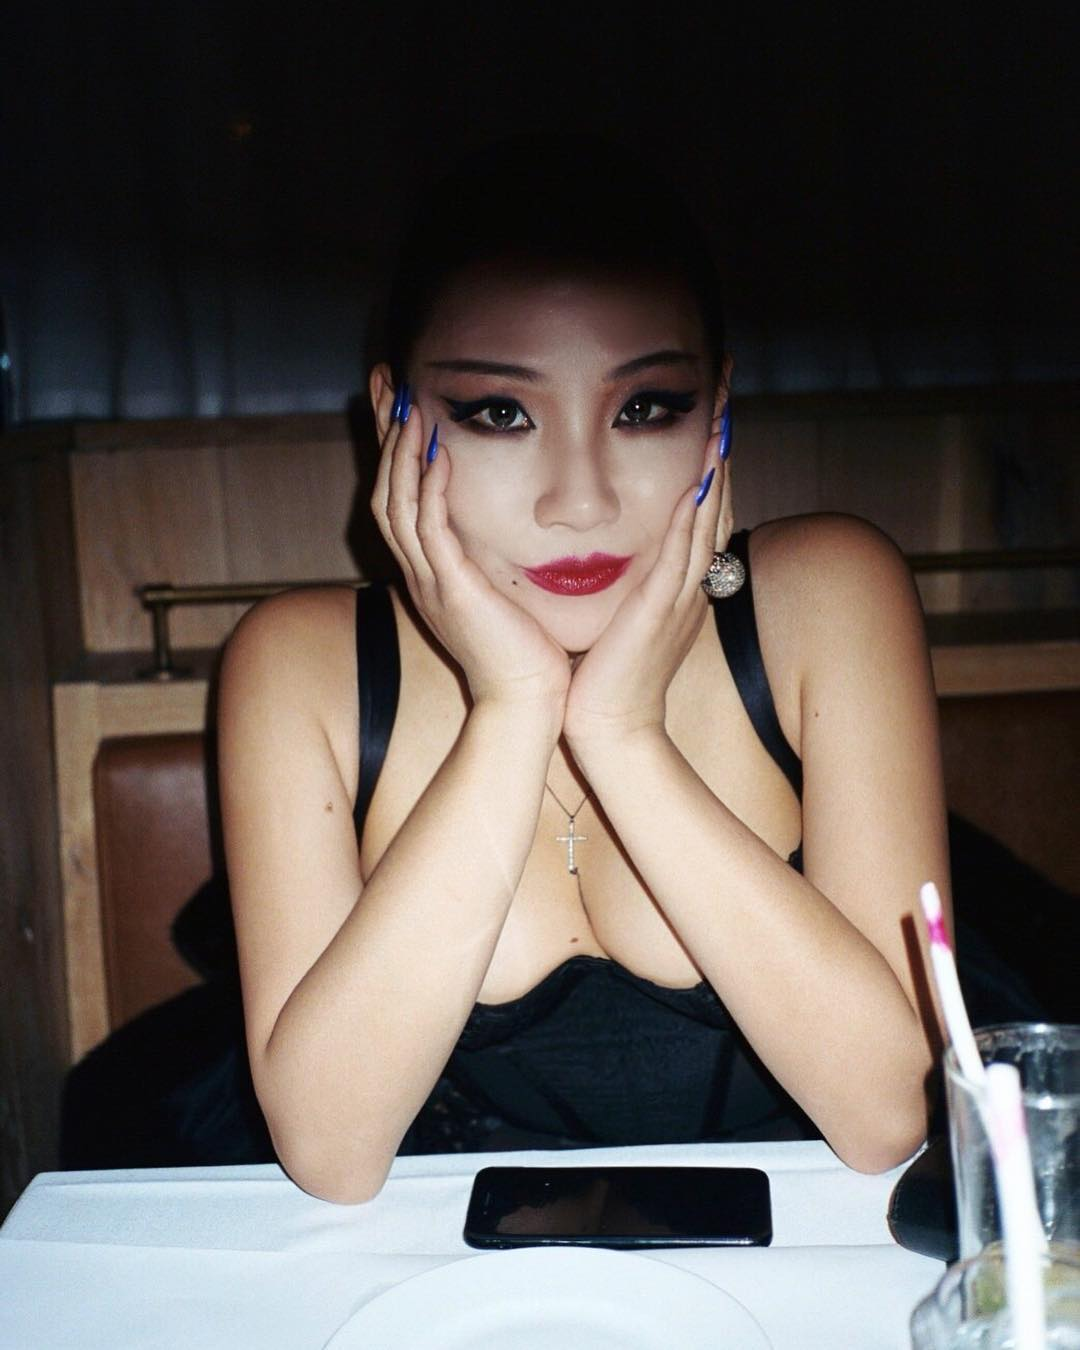 The Hottest Lee Chae Rin Photos - 12thBlog